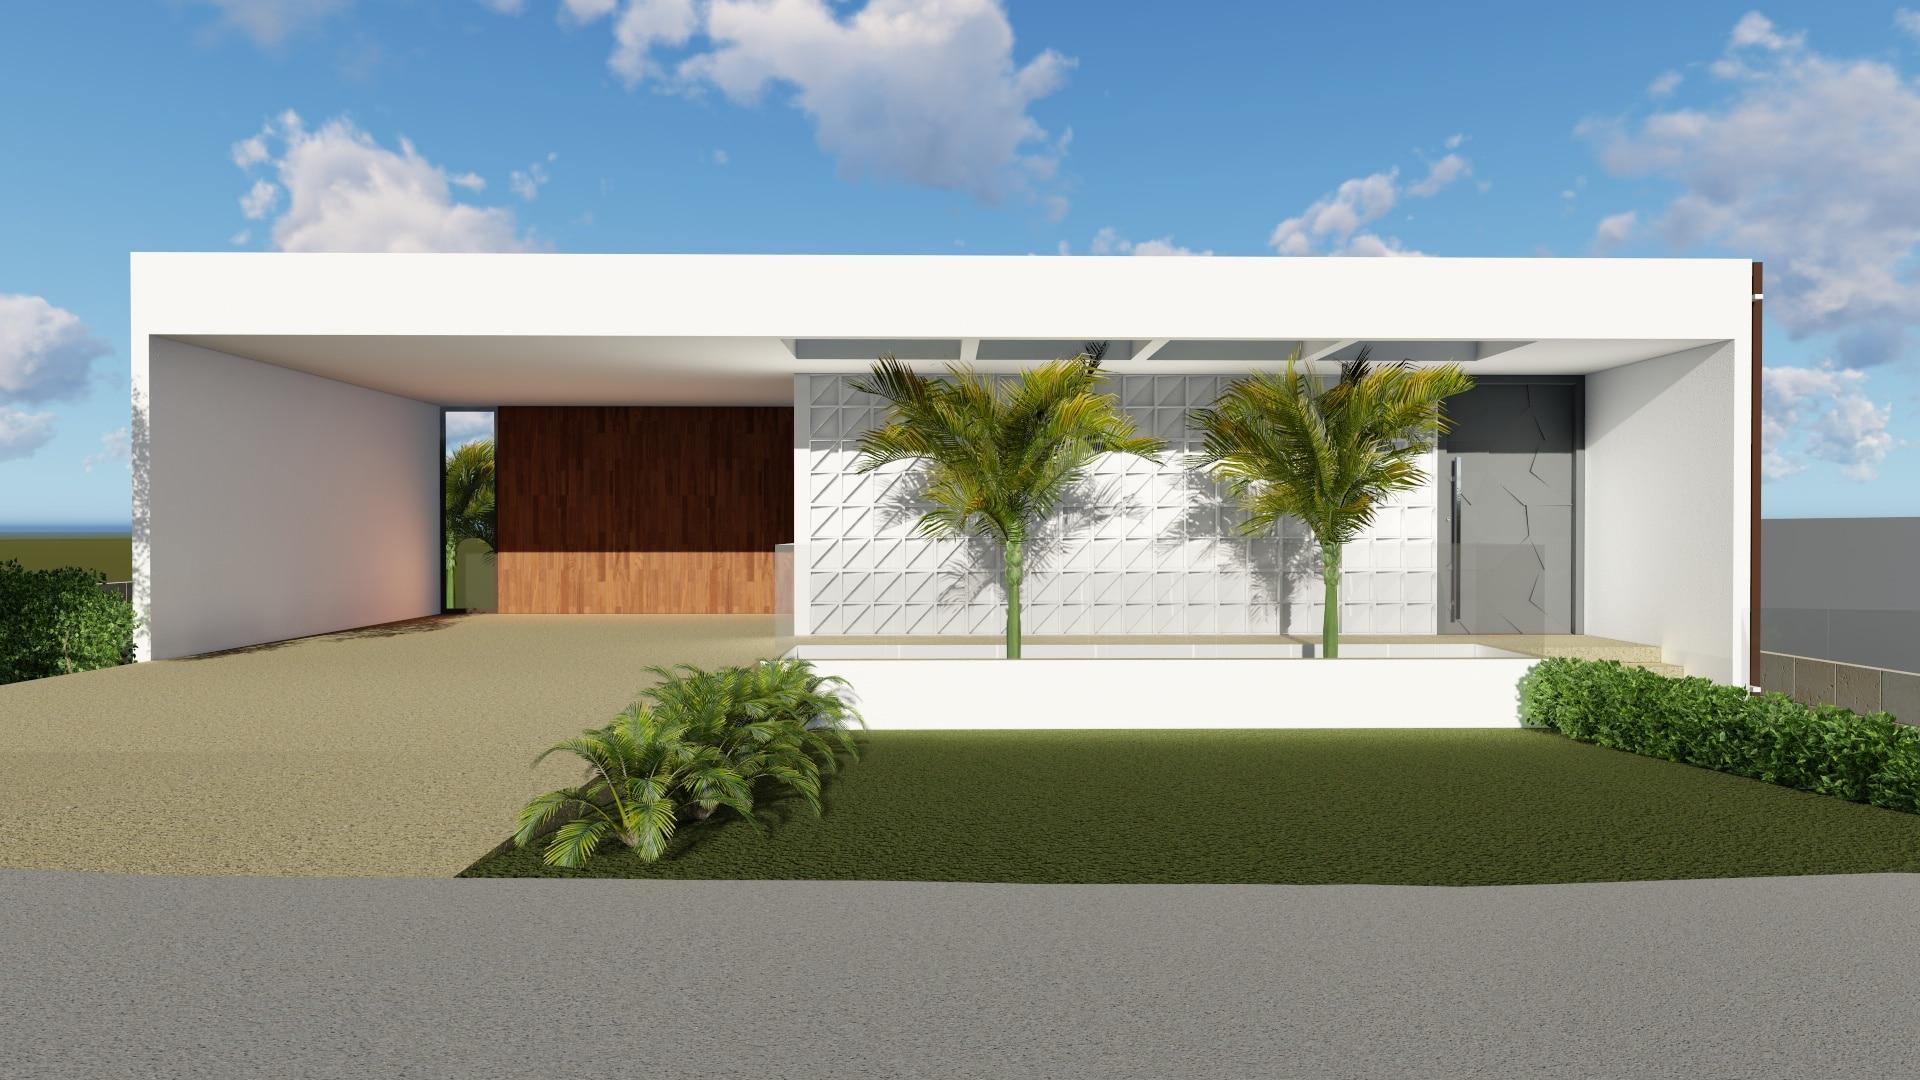 Arquitetura residencial itupeva village morro alto aresto for Casa minimalista residencial